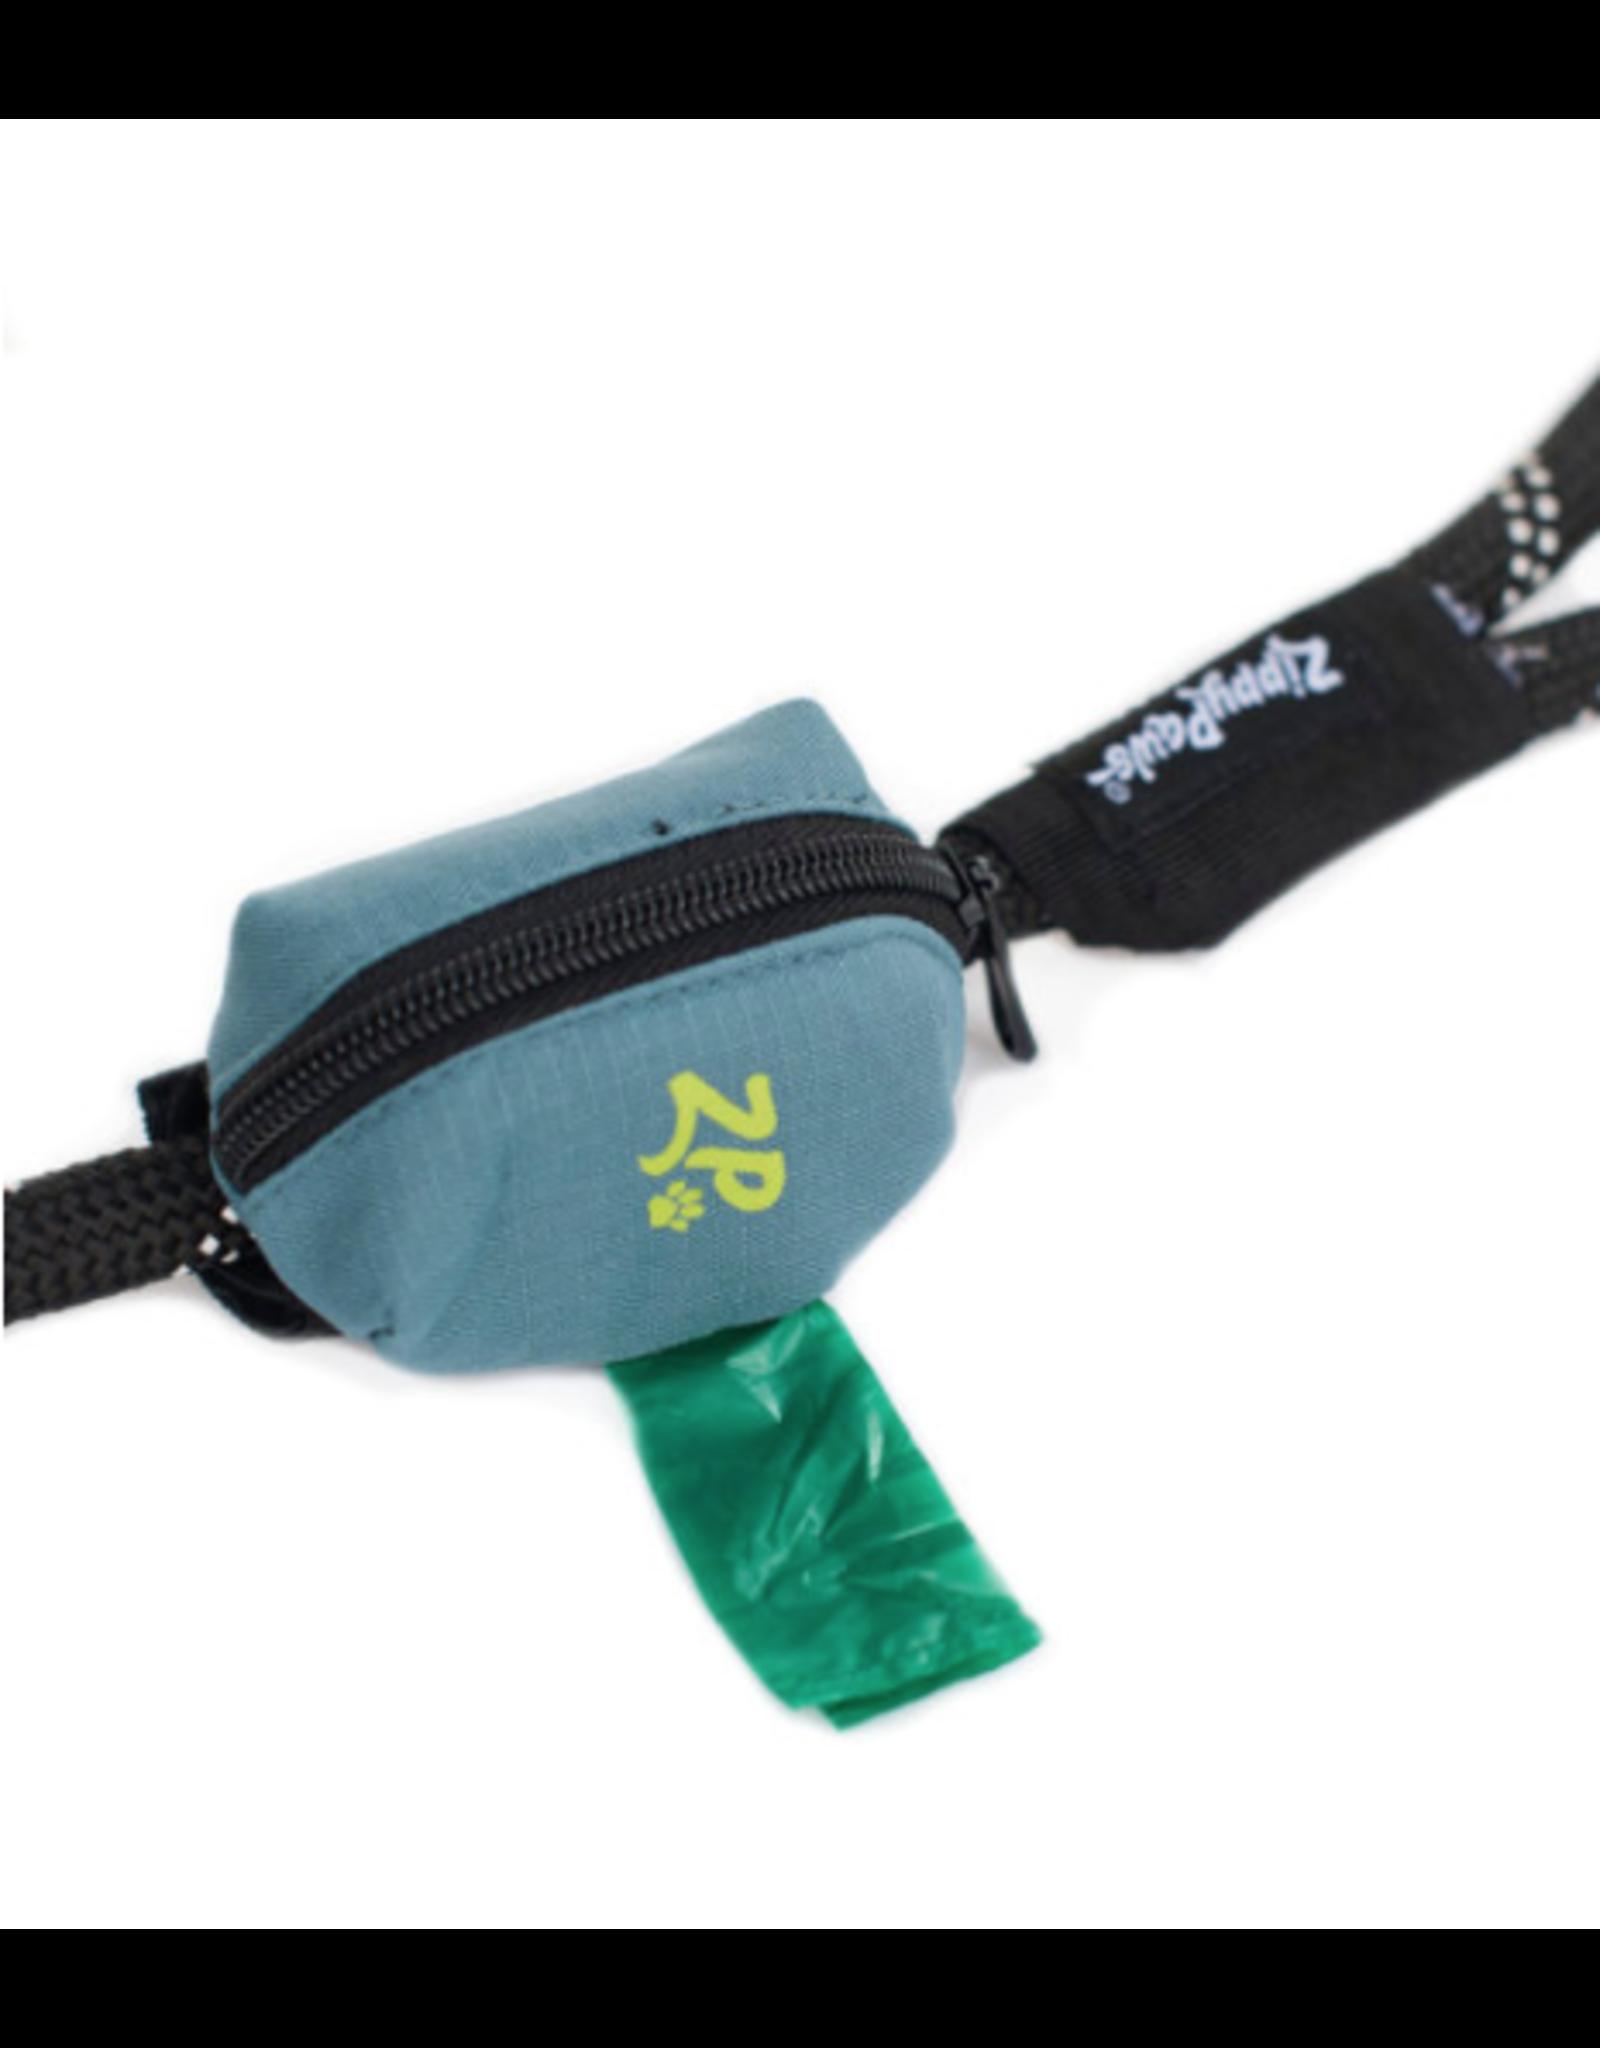 Zippy Paws Zippy Paws Adventure Leash Bag Dispenser